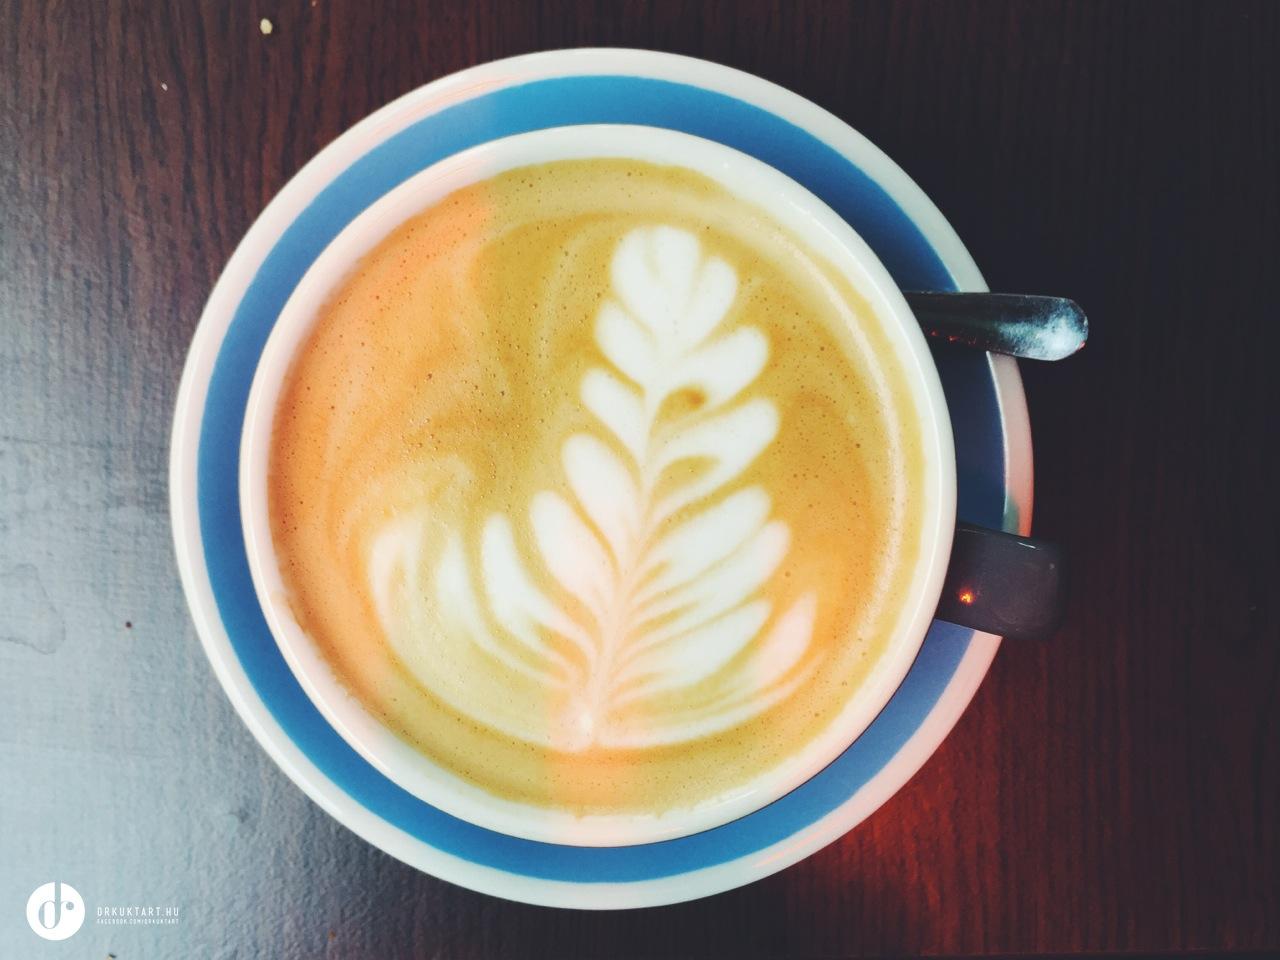 drkuktart_thisismelbournetoocoffee13.jpg